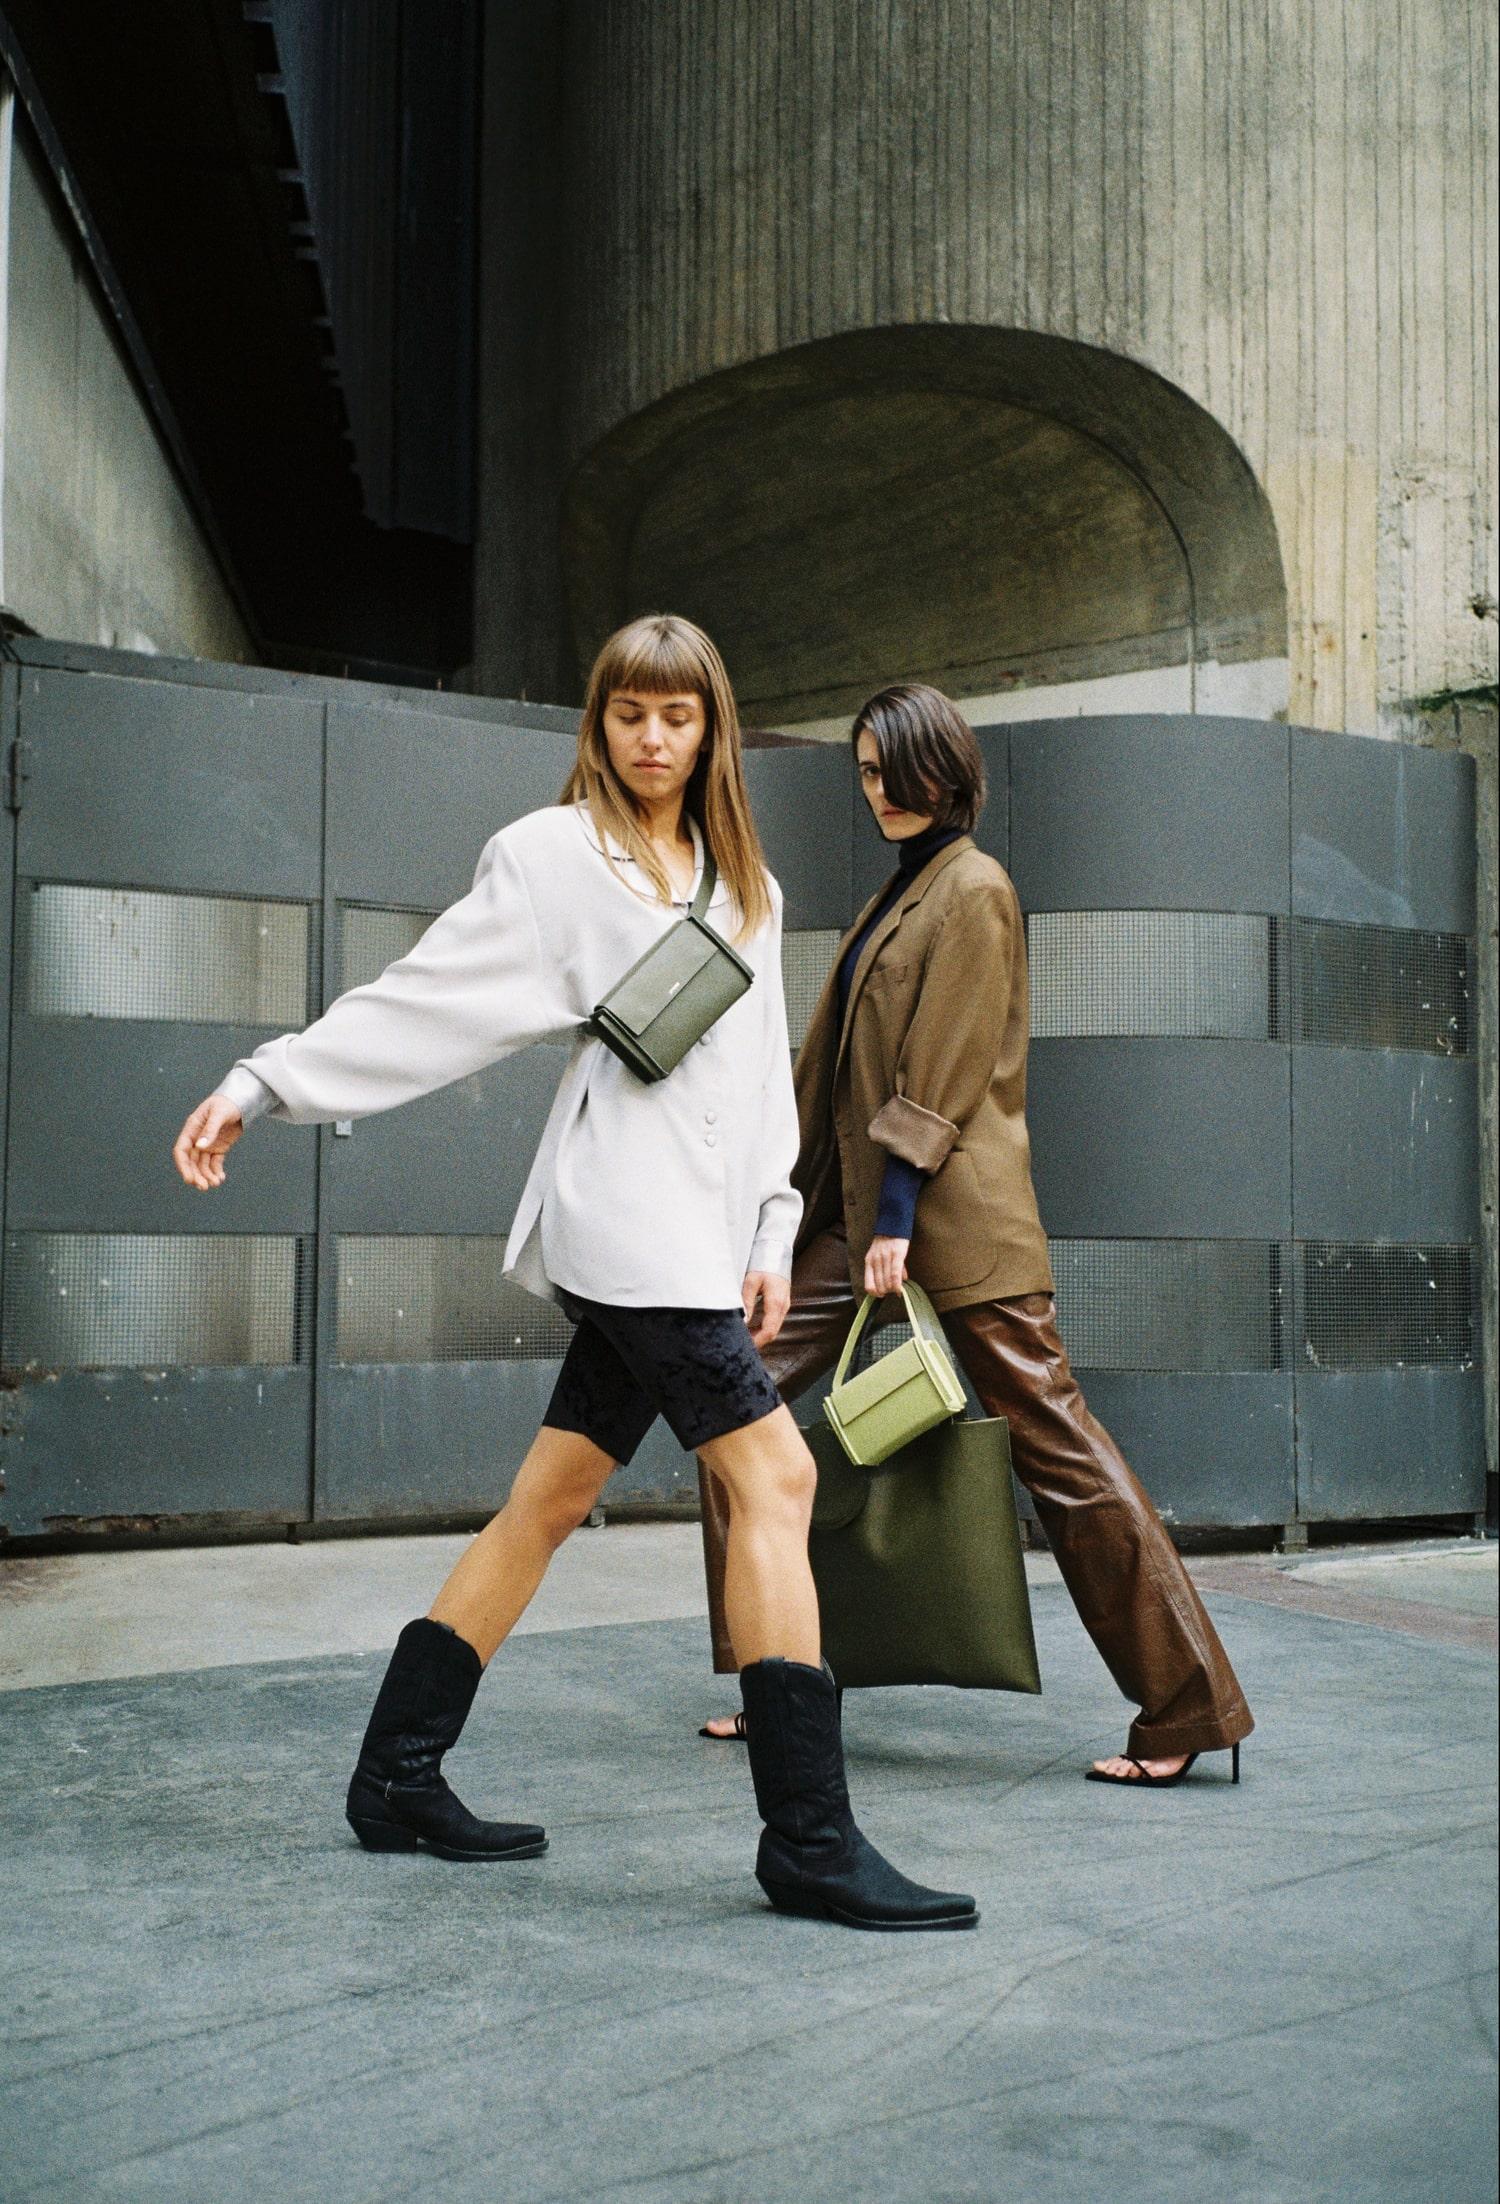 taja-spasskova-yrnche-artist-photography-contemporary-designblok